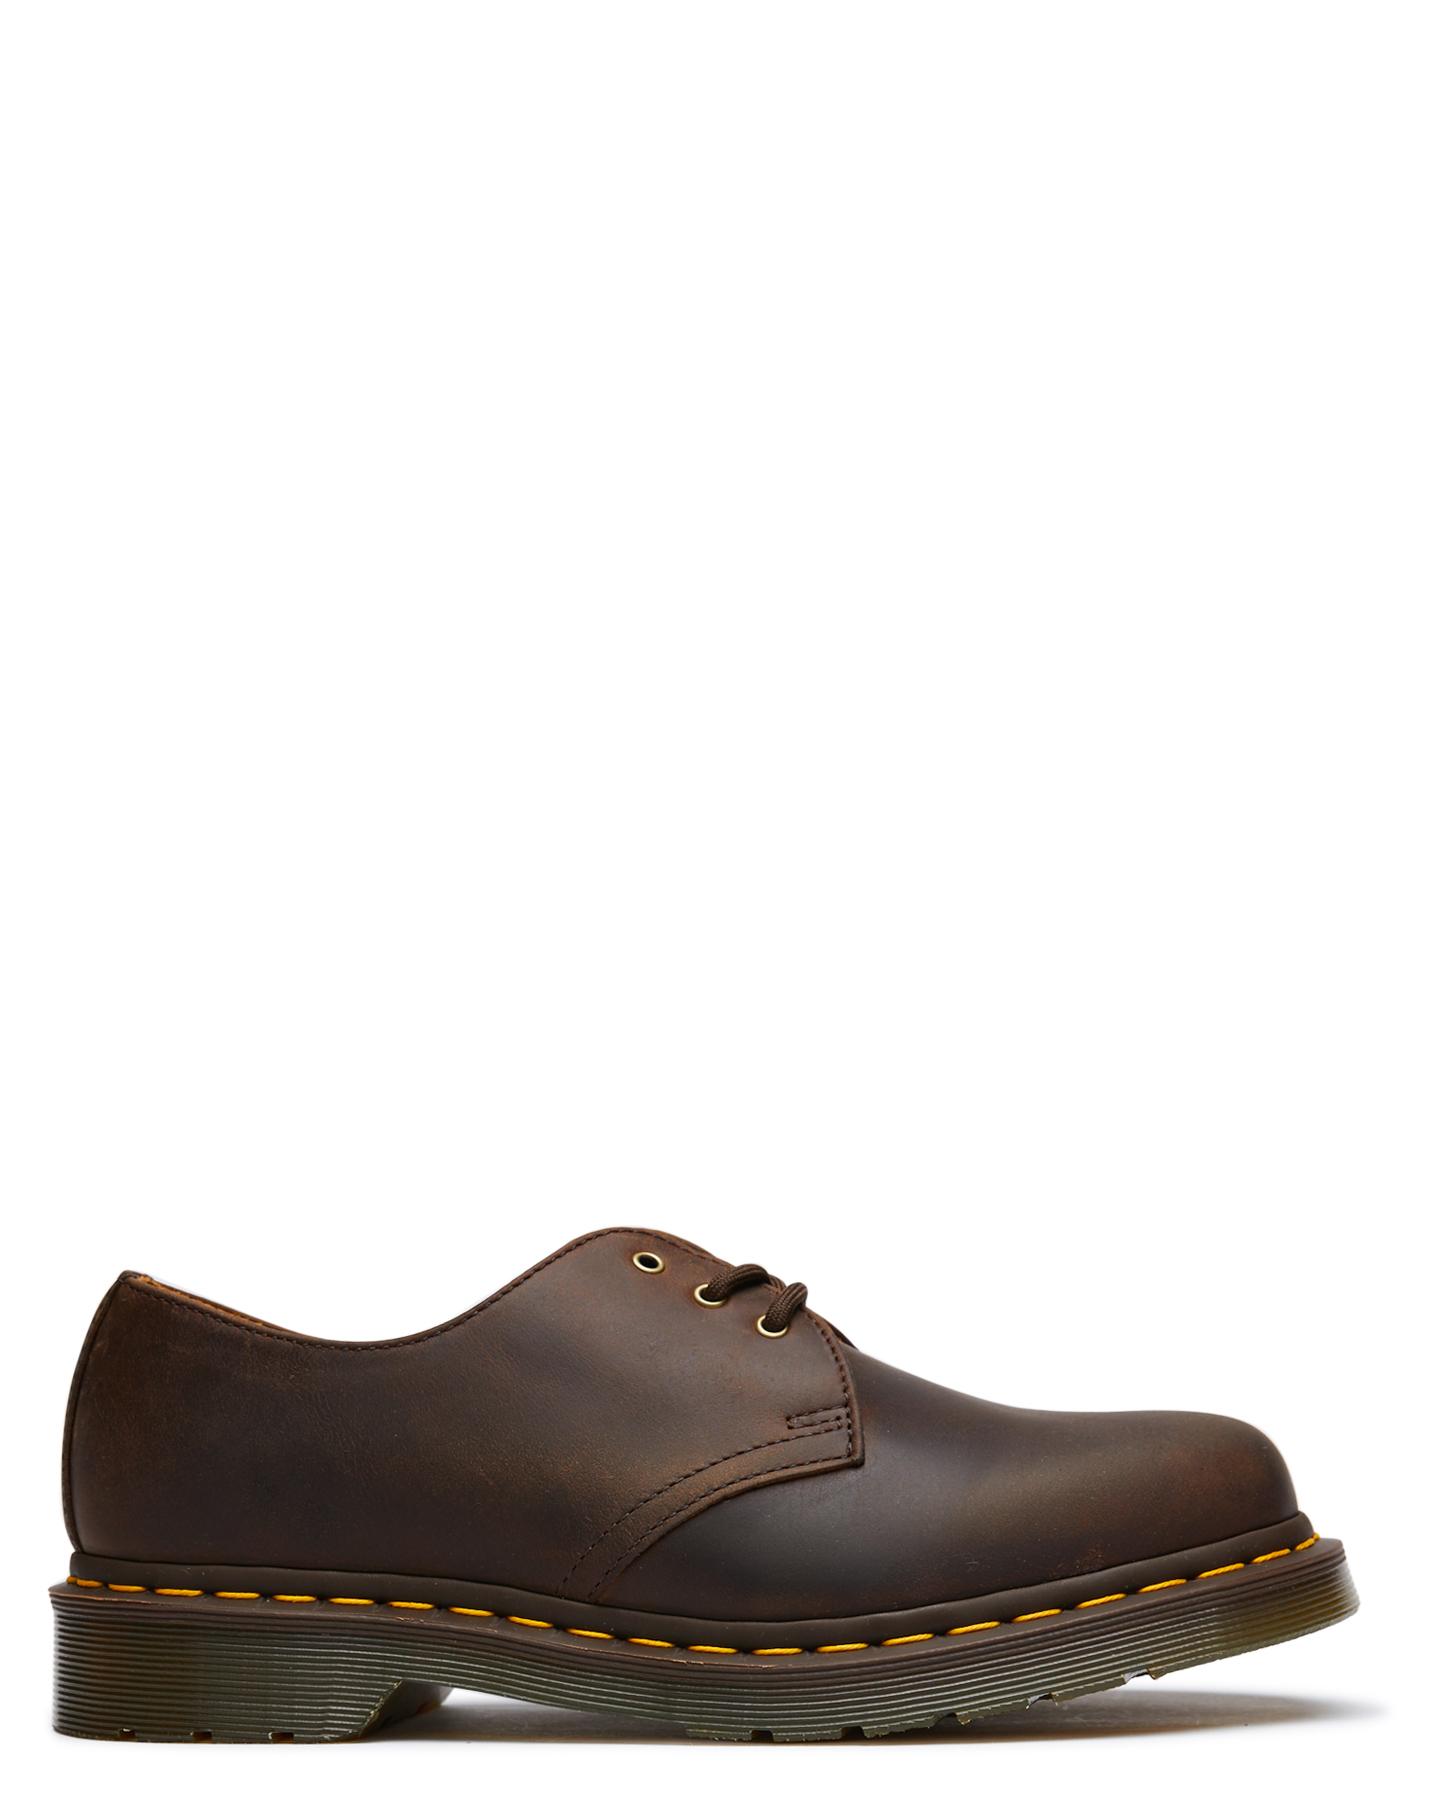 New Dr. Martens Women's Womens Classics 1461 shoes Rubber Brown